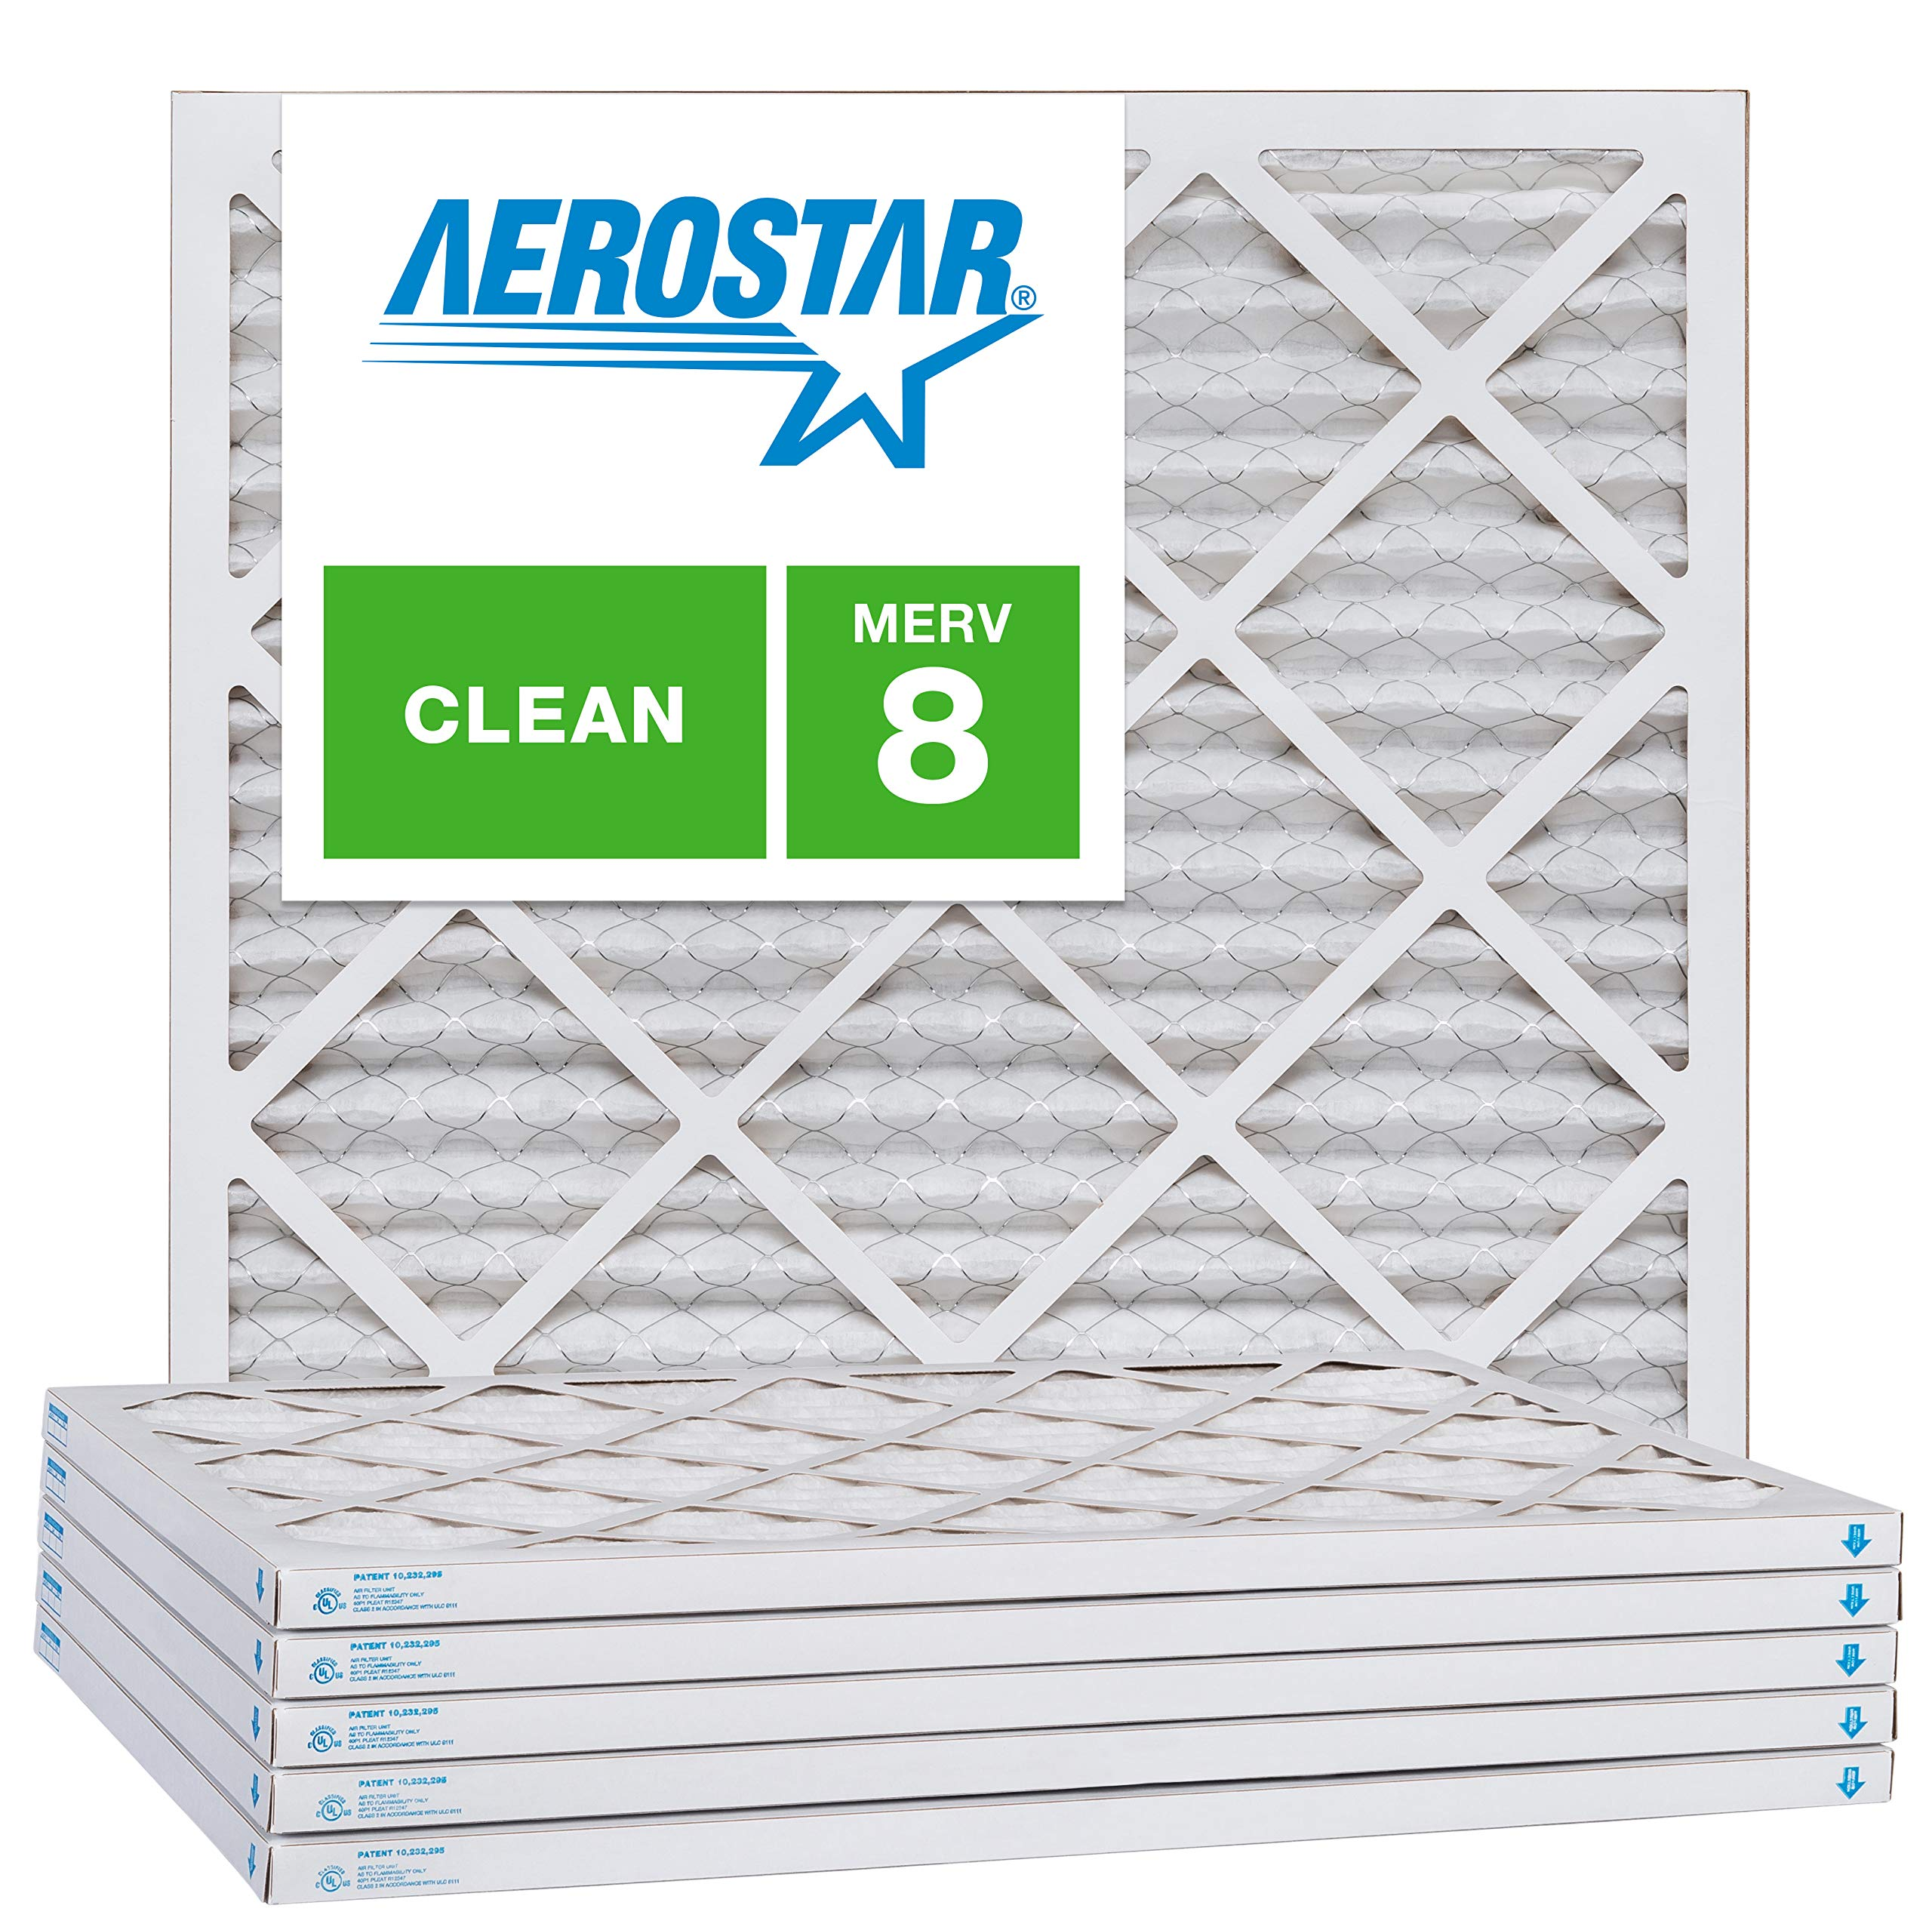 Aerostar 21x21x1 MERV 8, Pleated Air Filter, 21x21x1, Box of 6, Made in The USA